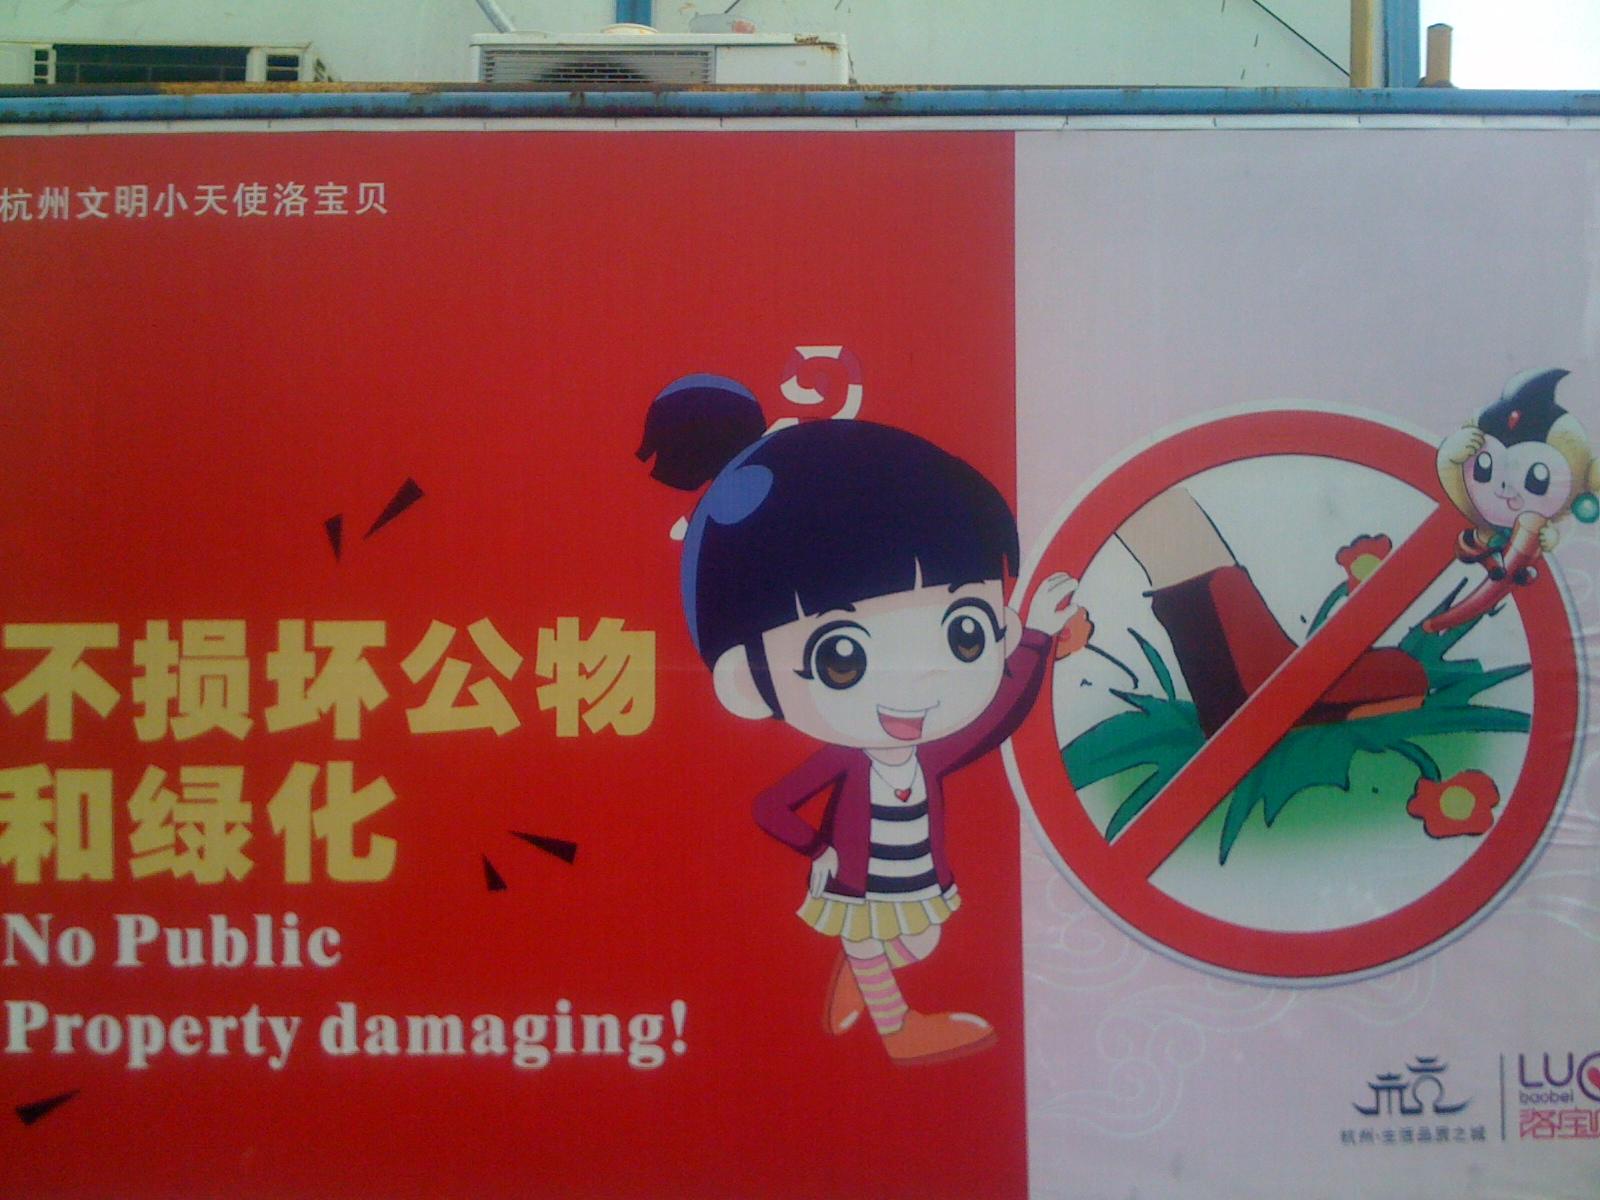 propaganda w Chinach, Chiny, chińska propaganda,